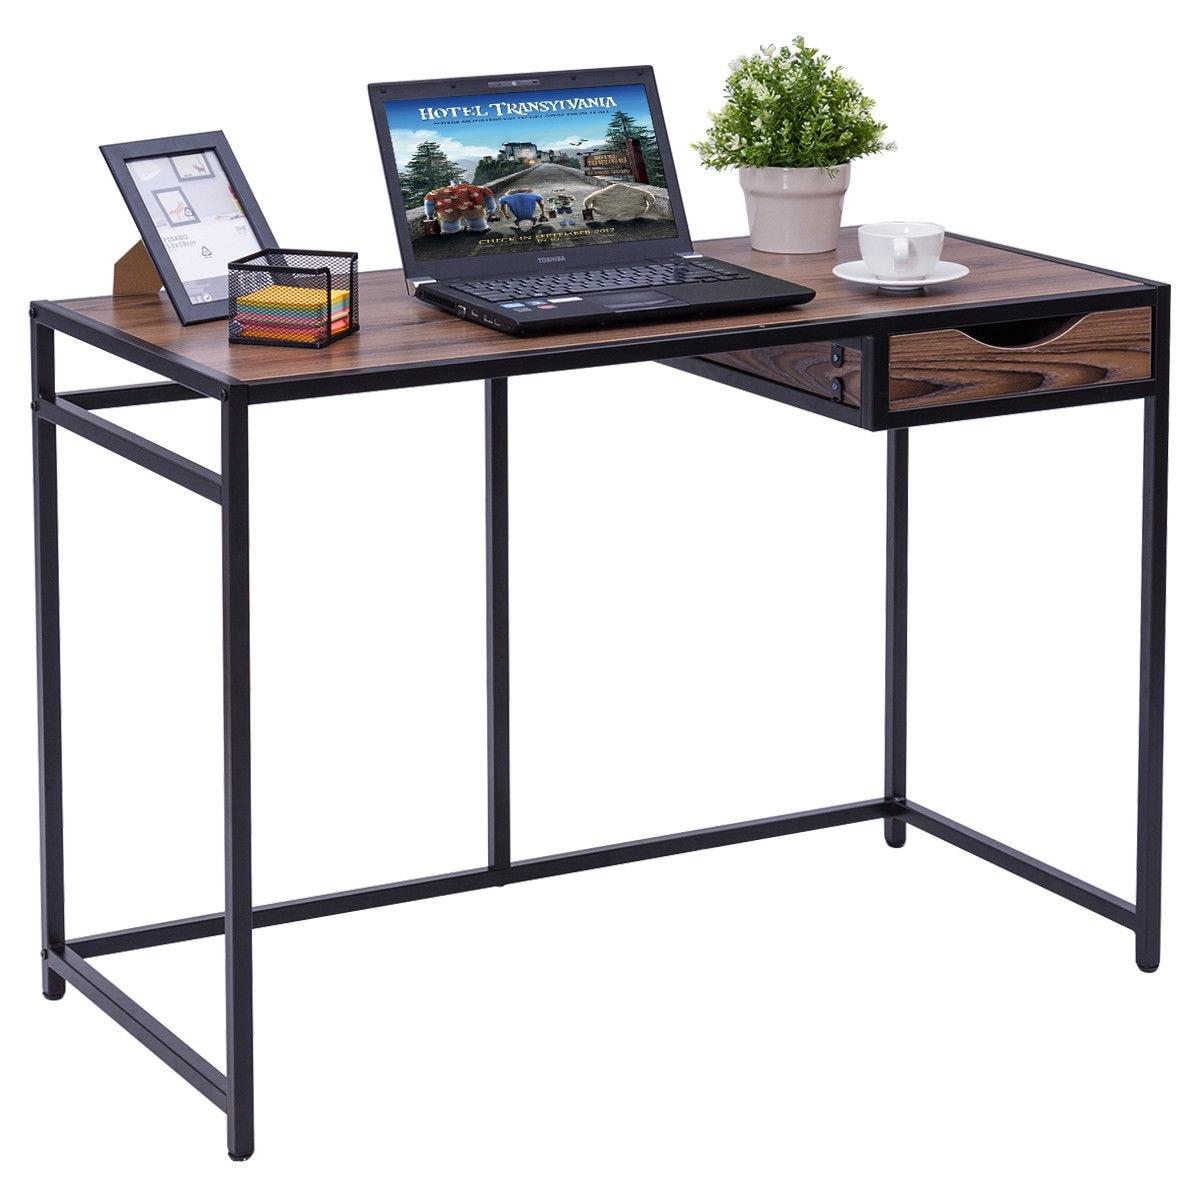 Shop Costway Computer Desk PC Laptop Table Wood Top Metal Frame ...